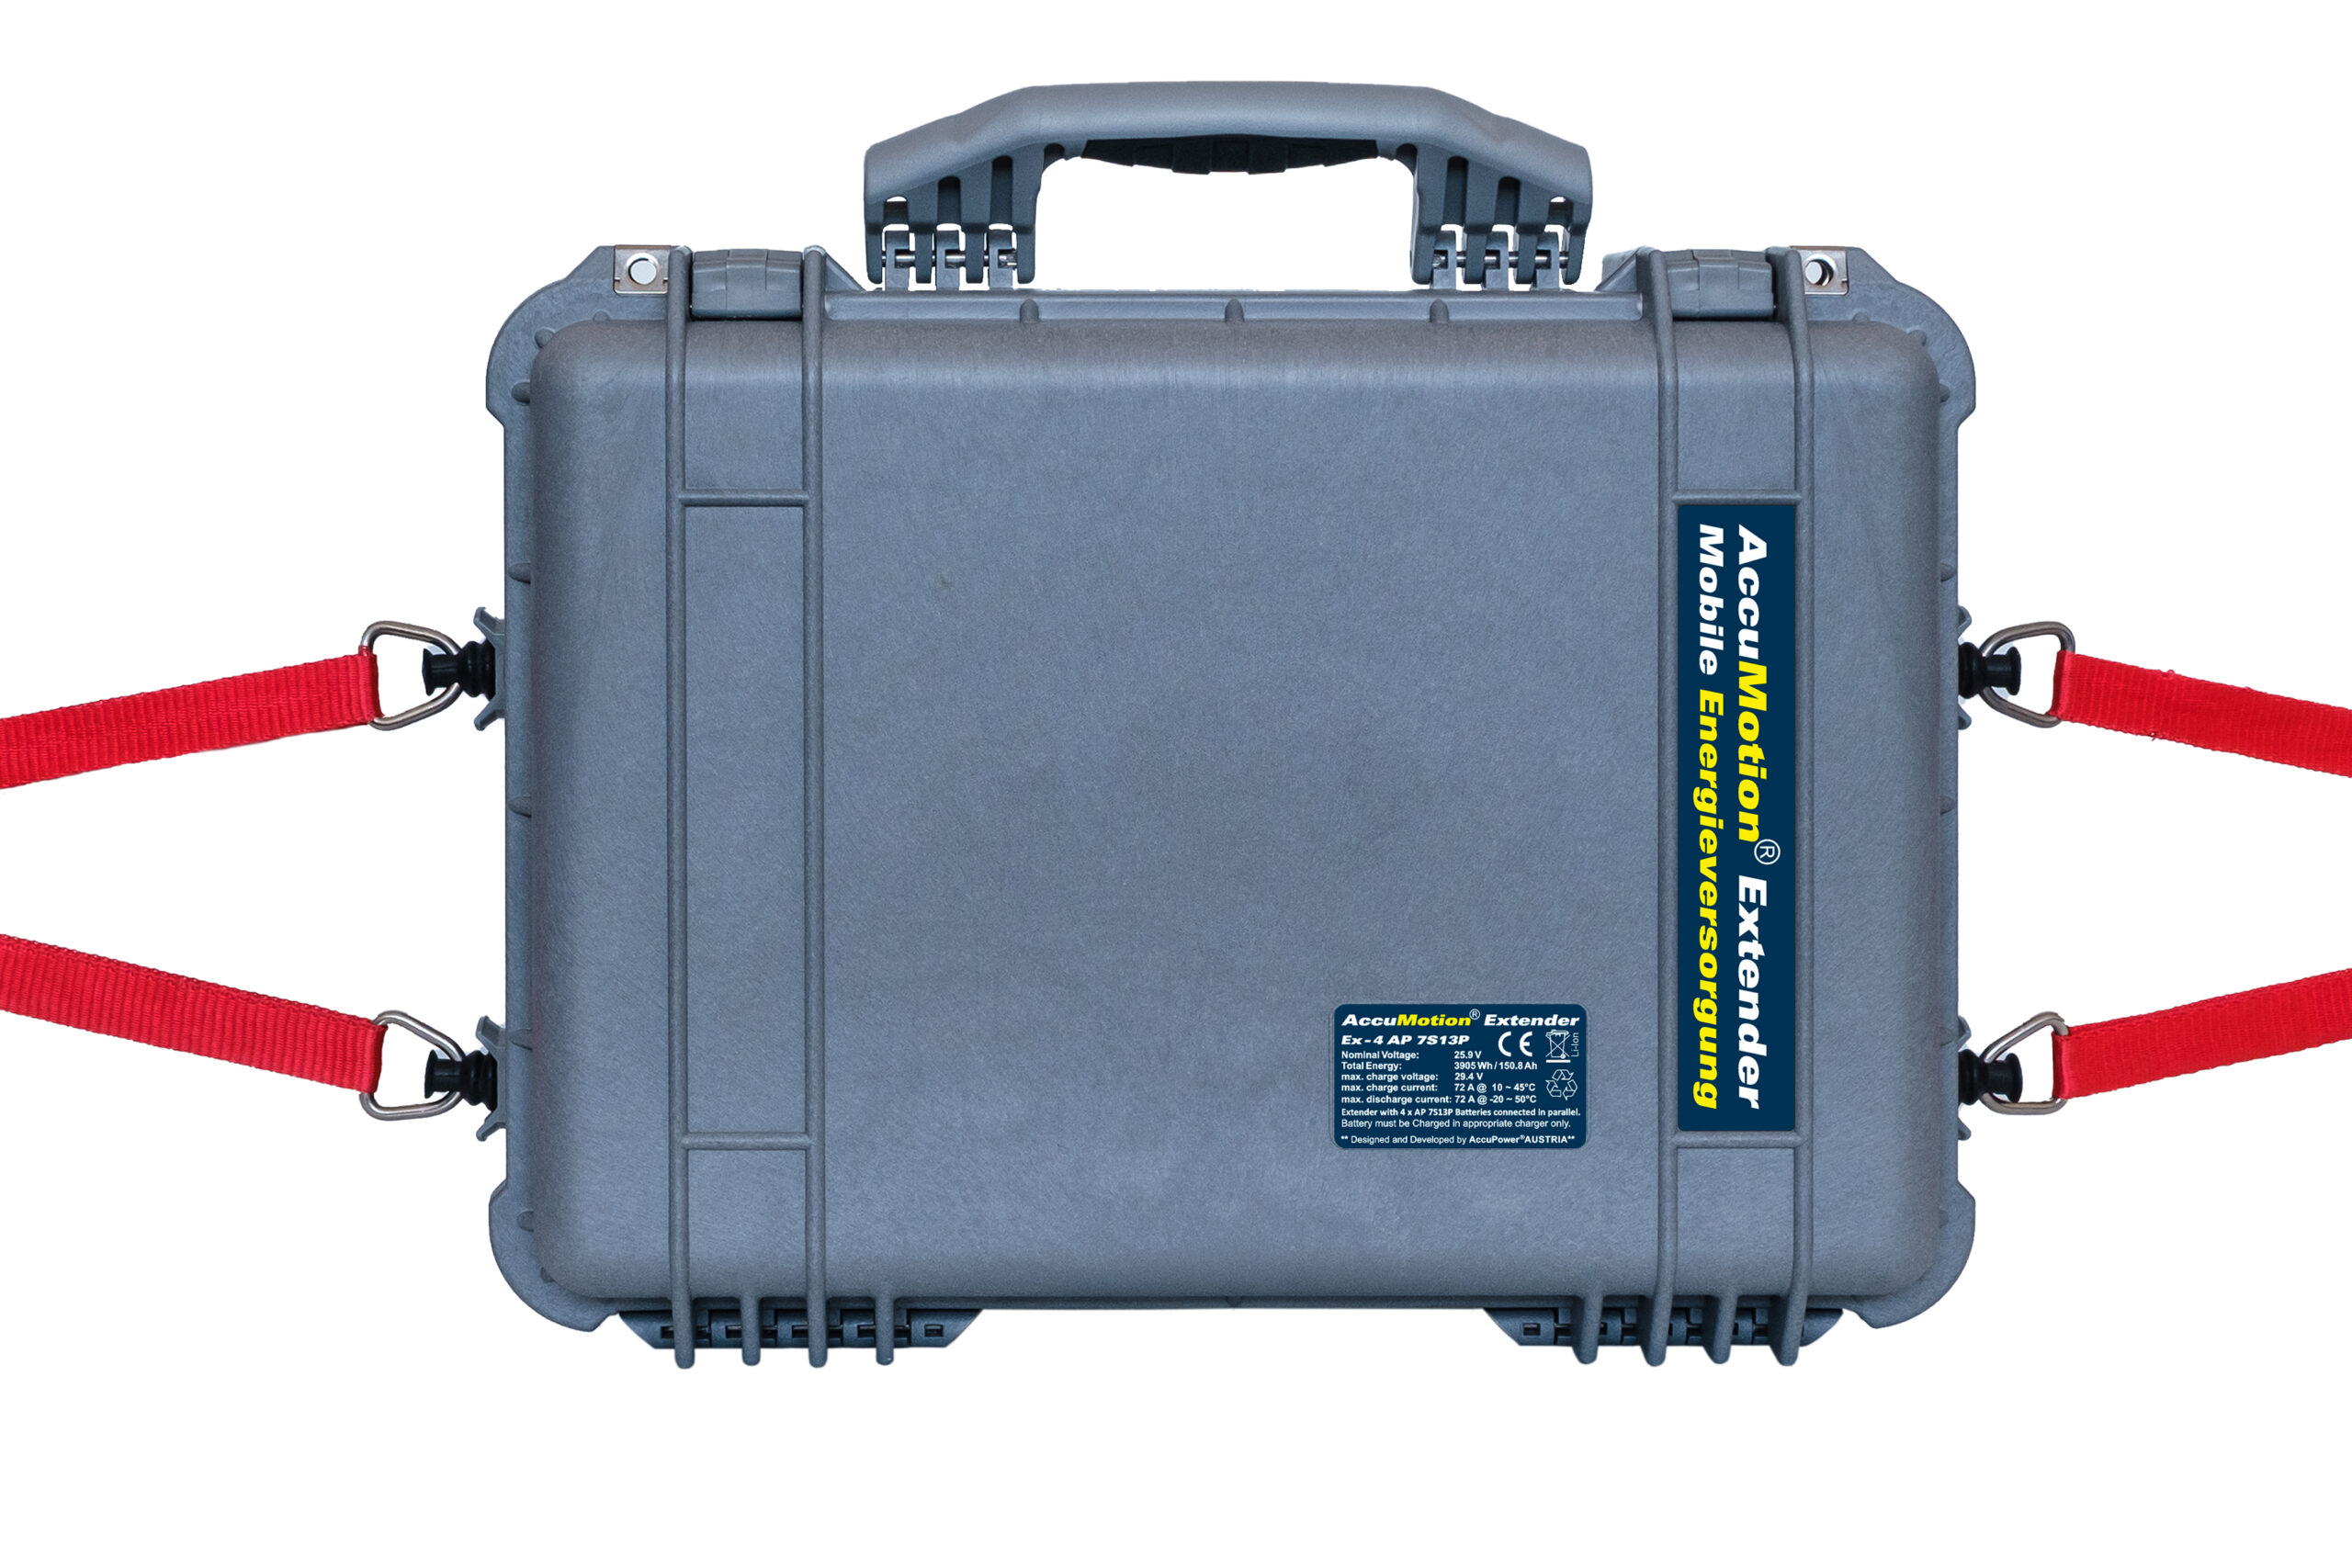 AccuMotion Extender – Mobile Energieversorgung 25,9V 150,8Ah 3905Wh